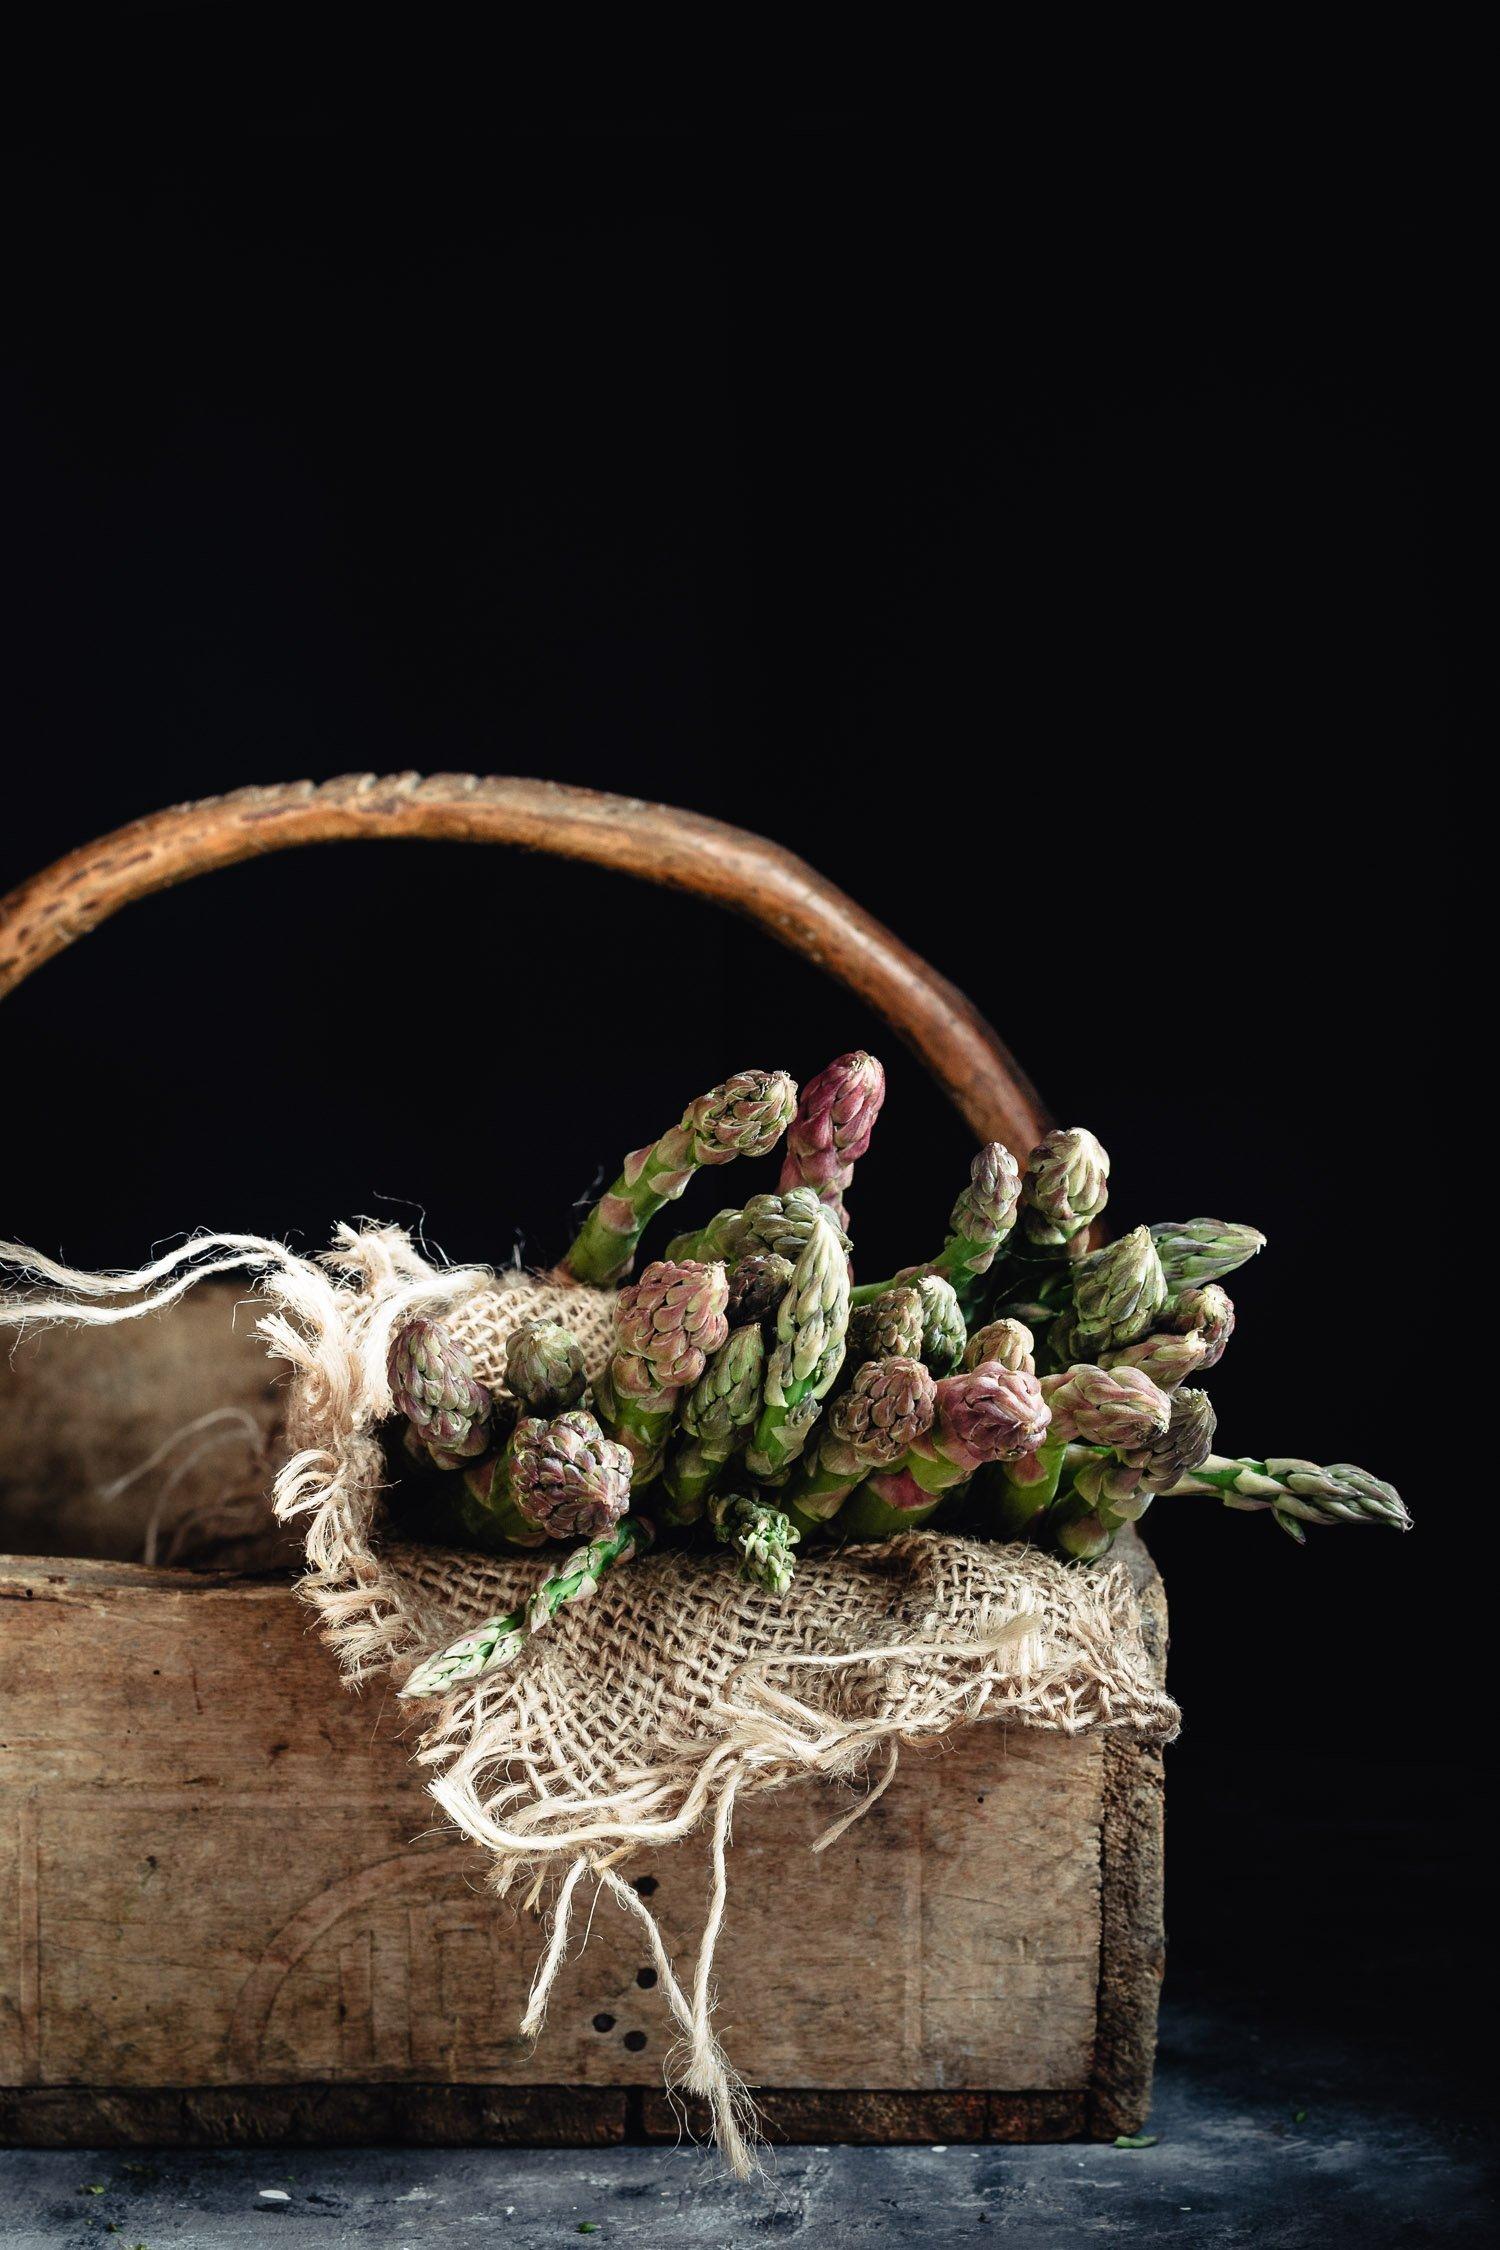 Raw asparagus into a basket